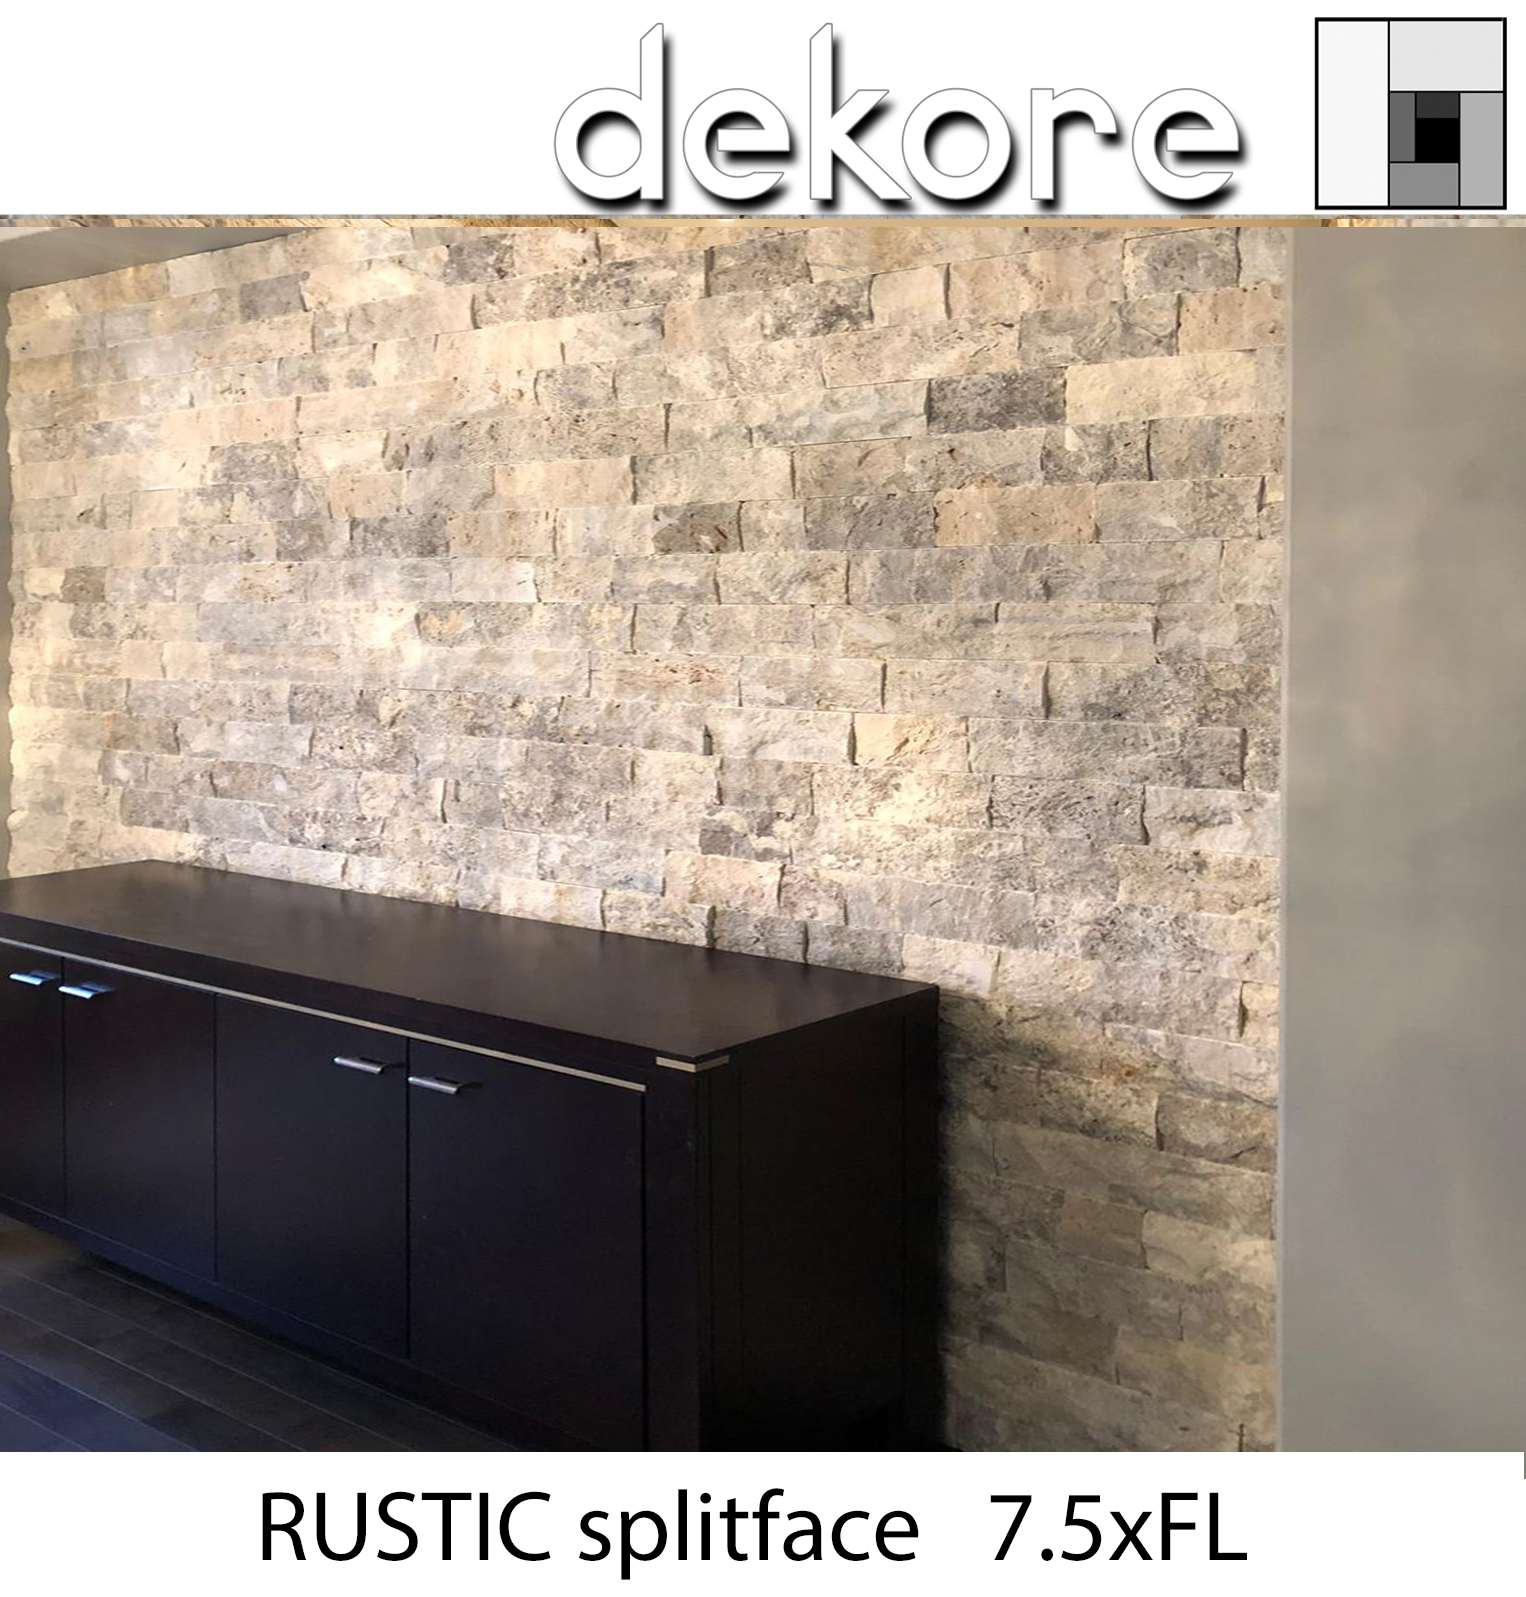 realizacja rustic split_compressed